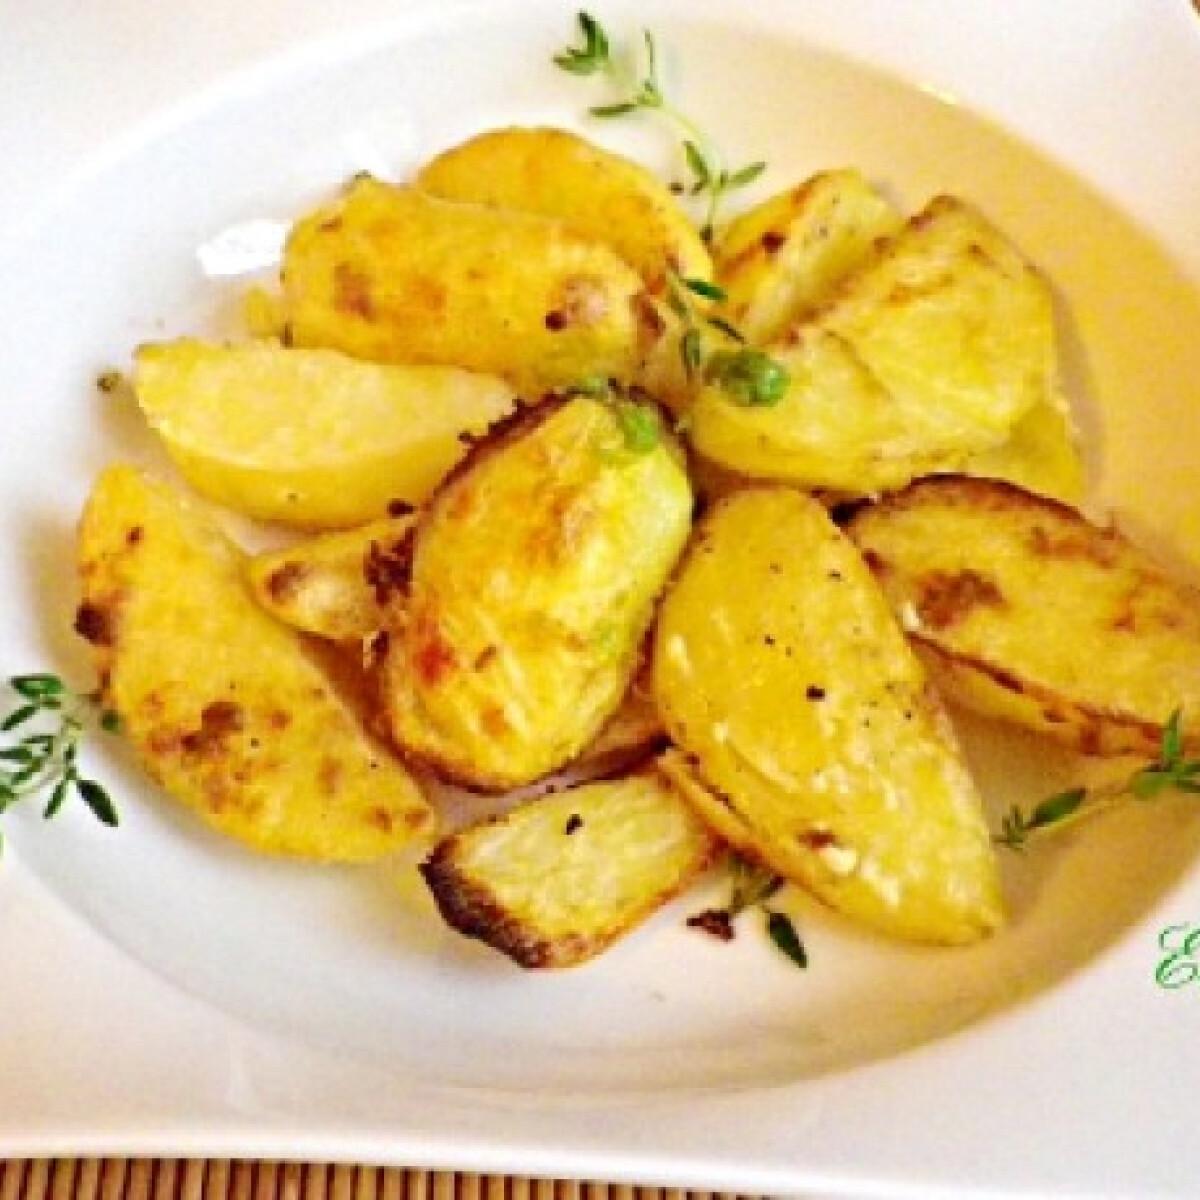 Ezen a képen: Wasabis krumpli